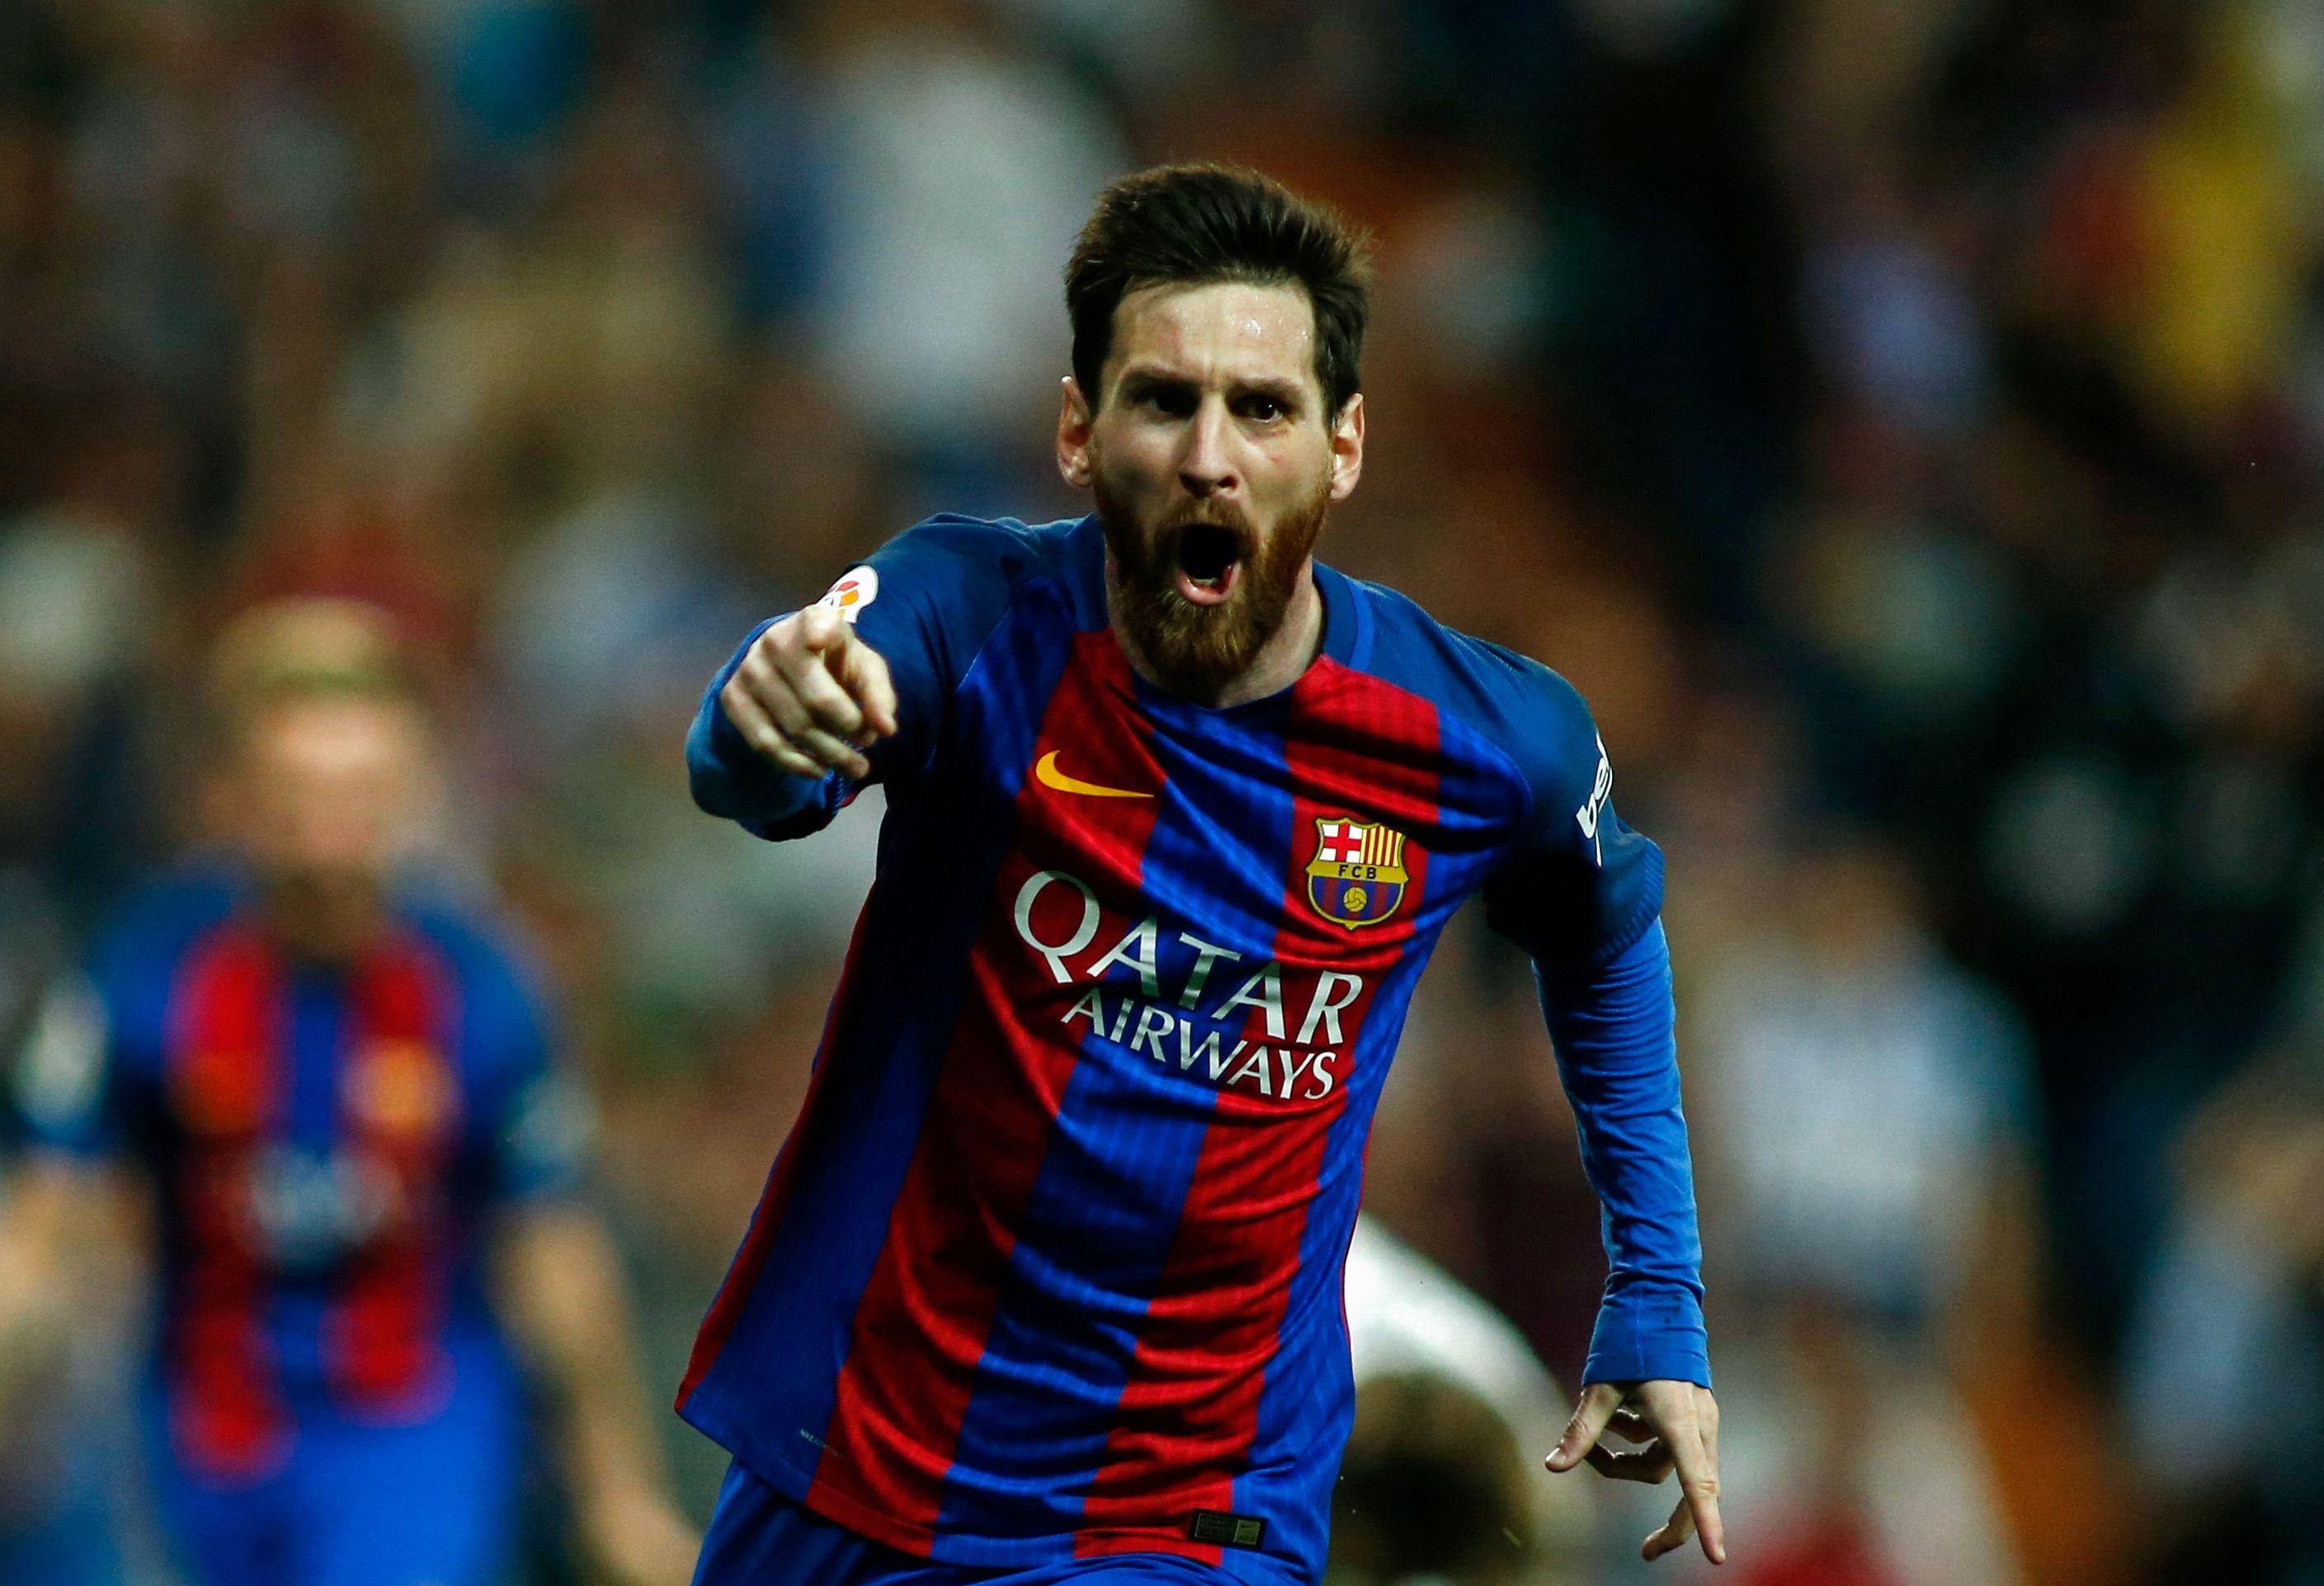 quality design d4c85 3f774 El Clasico: Real 2-3 Barcelona - Messi scores last-second ...